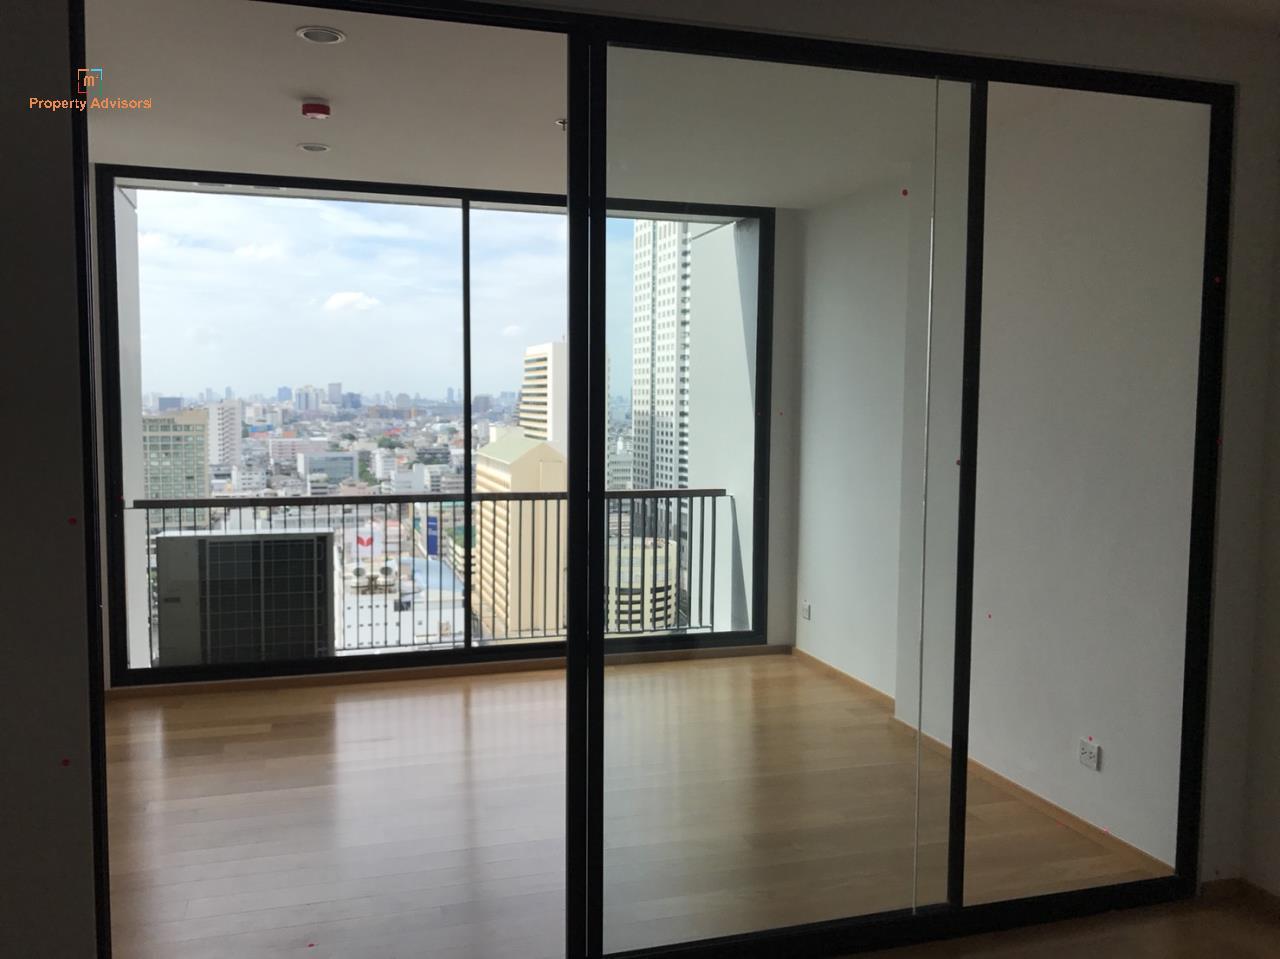 m2 Property Advisors Agency's Noble Revo Silom - New city view high floor room 1